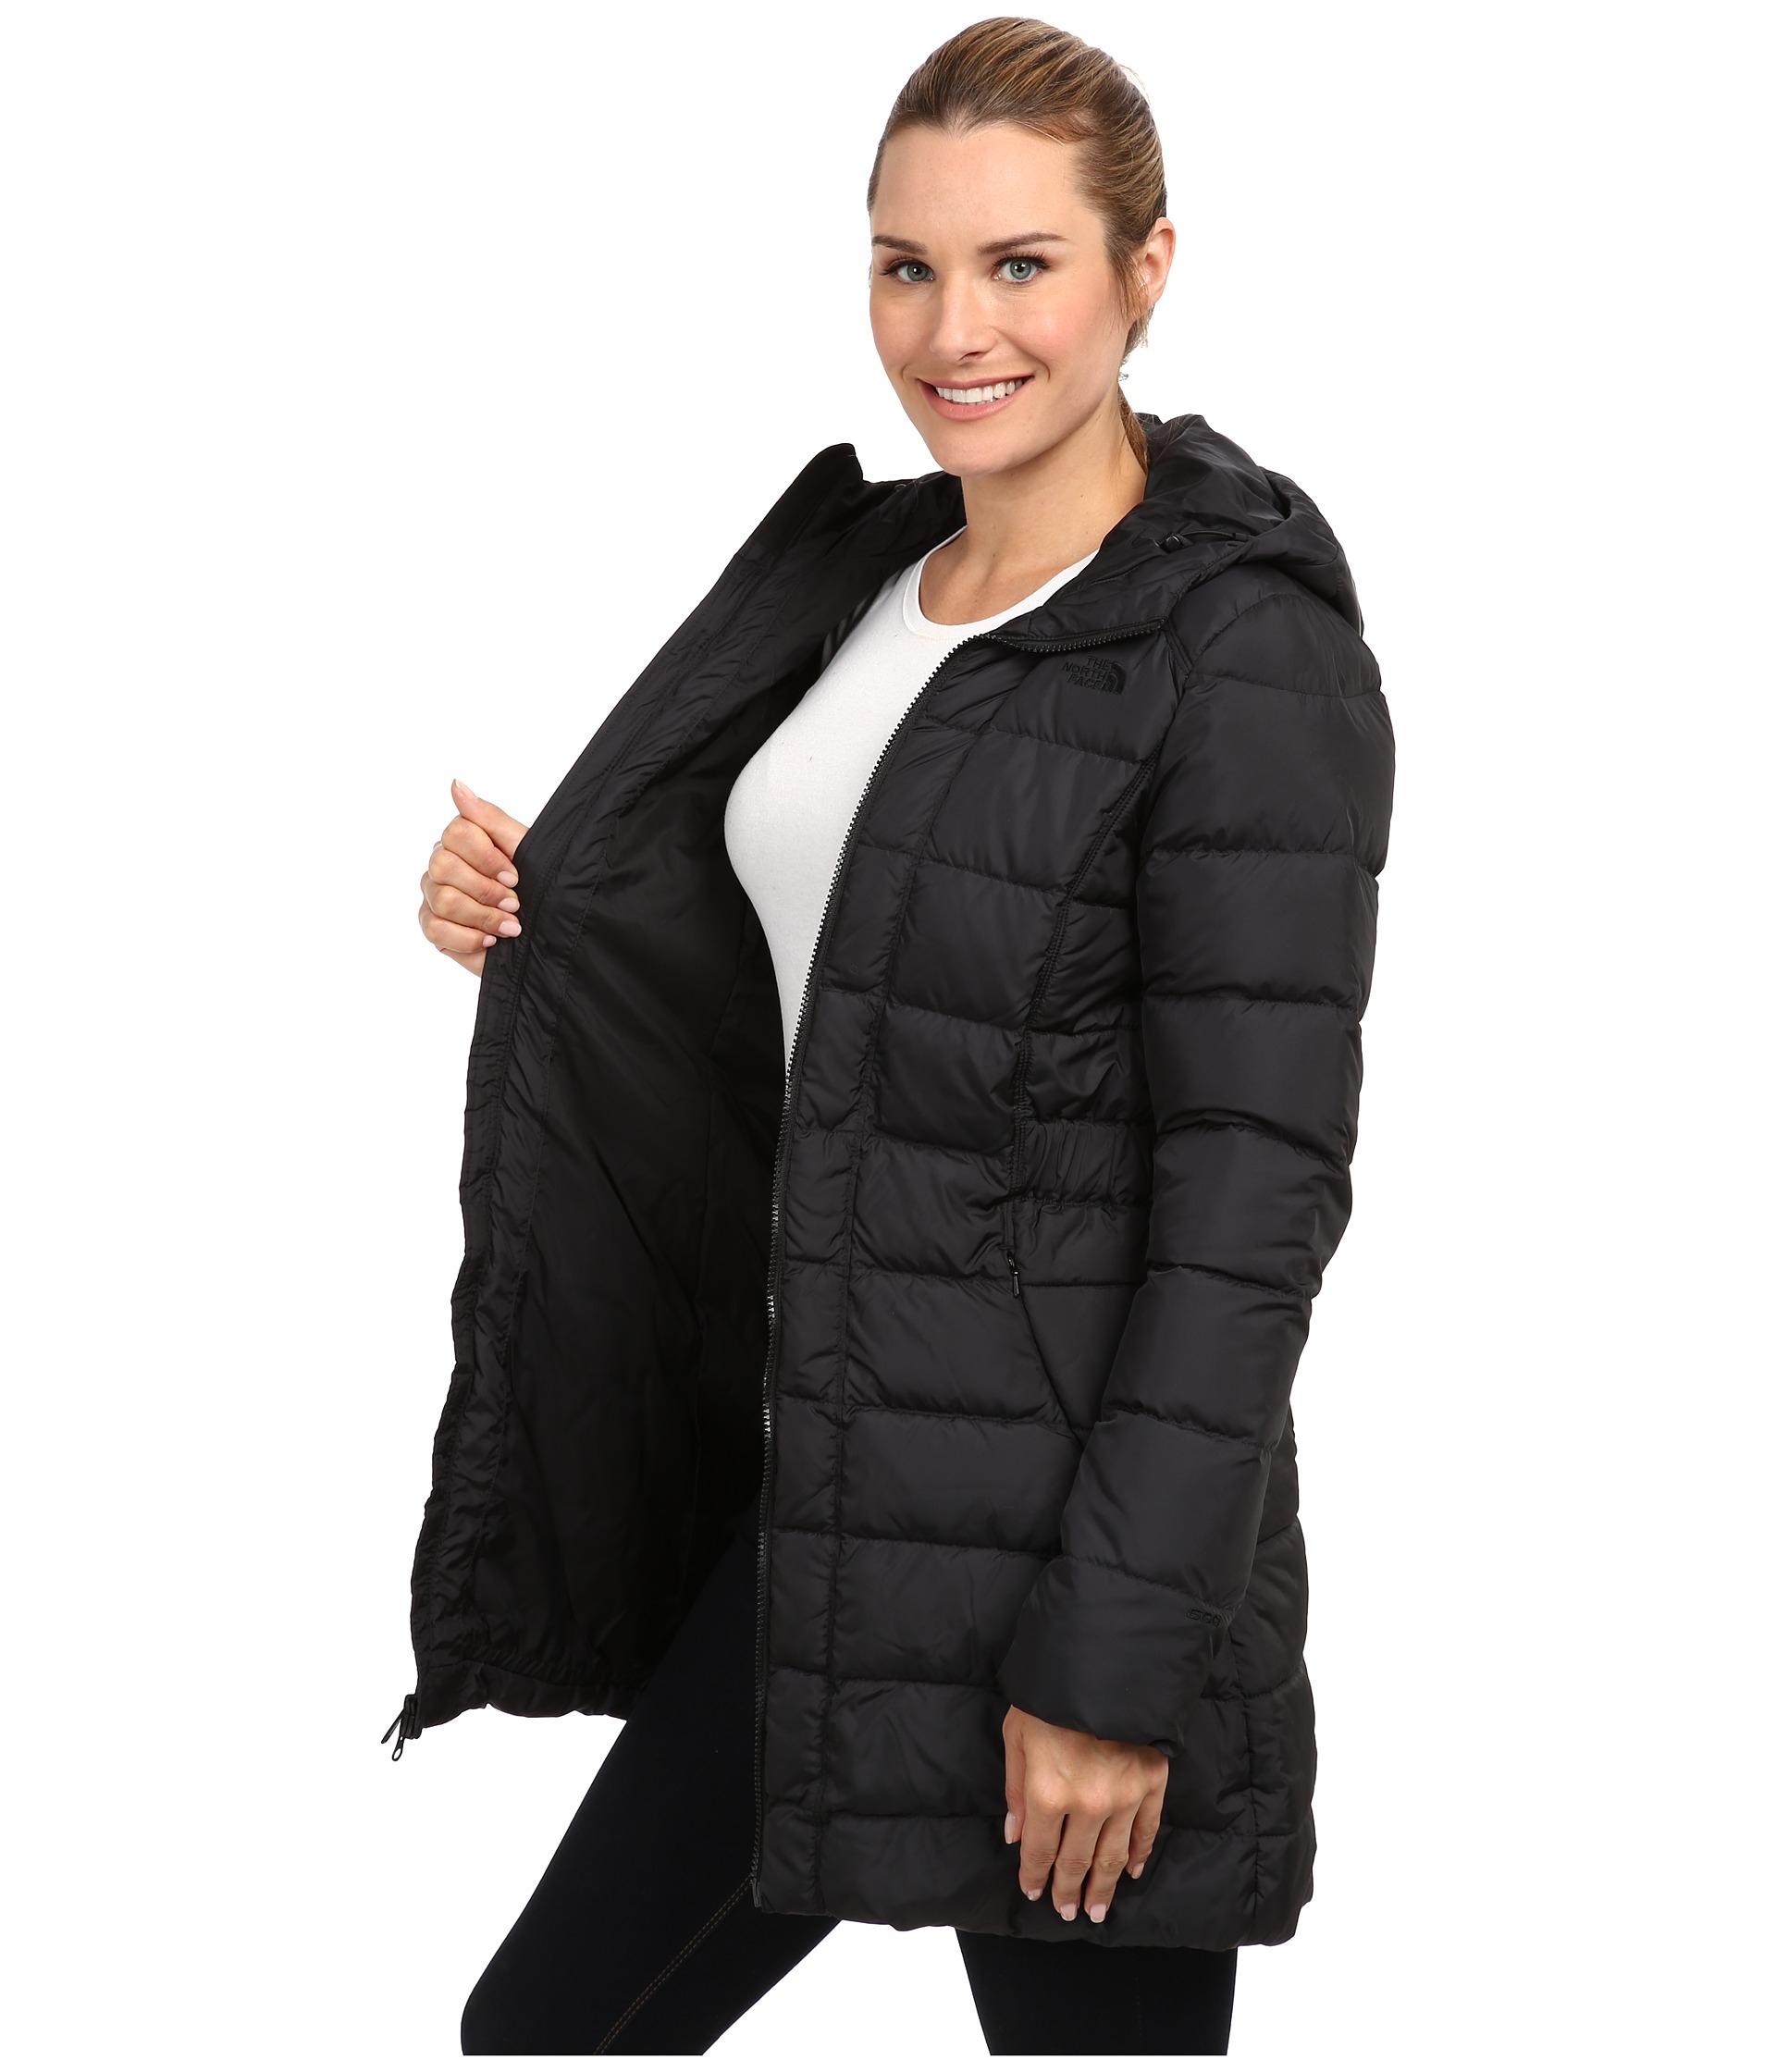 womens north face transit jacket sale - Marwood VeneerMarwood Veneer 4818040d6